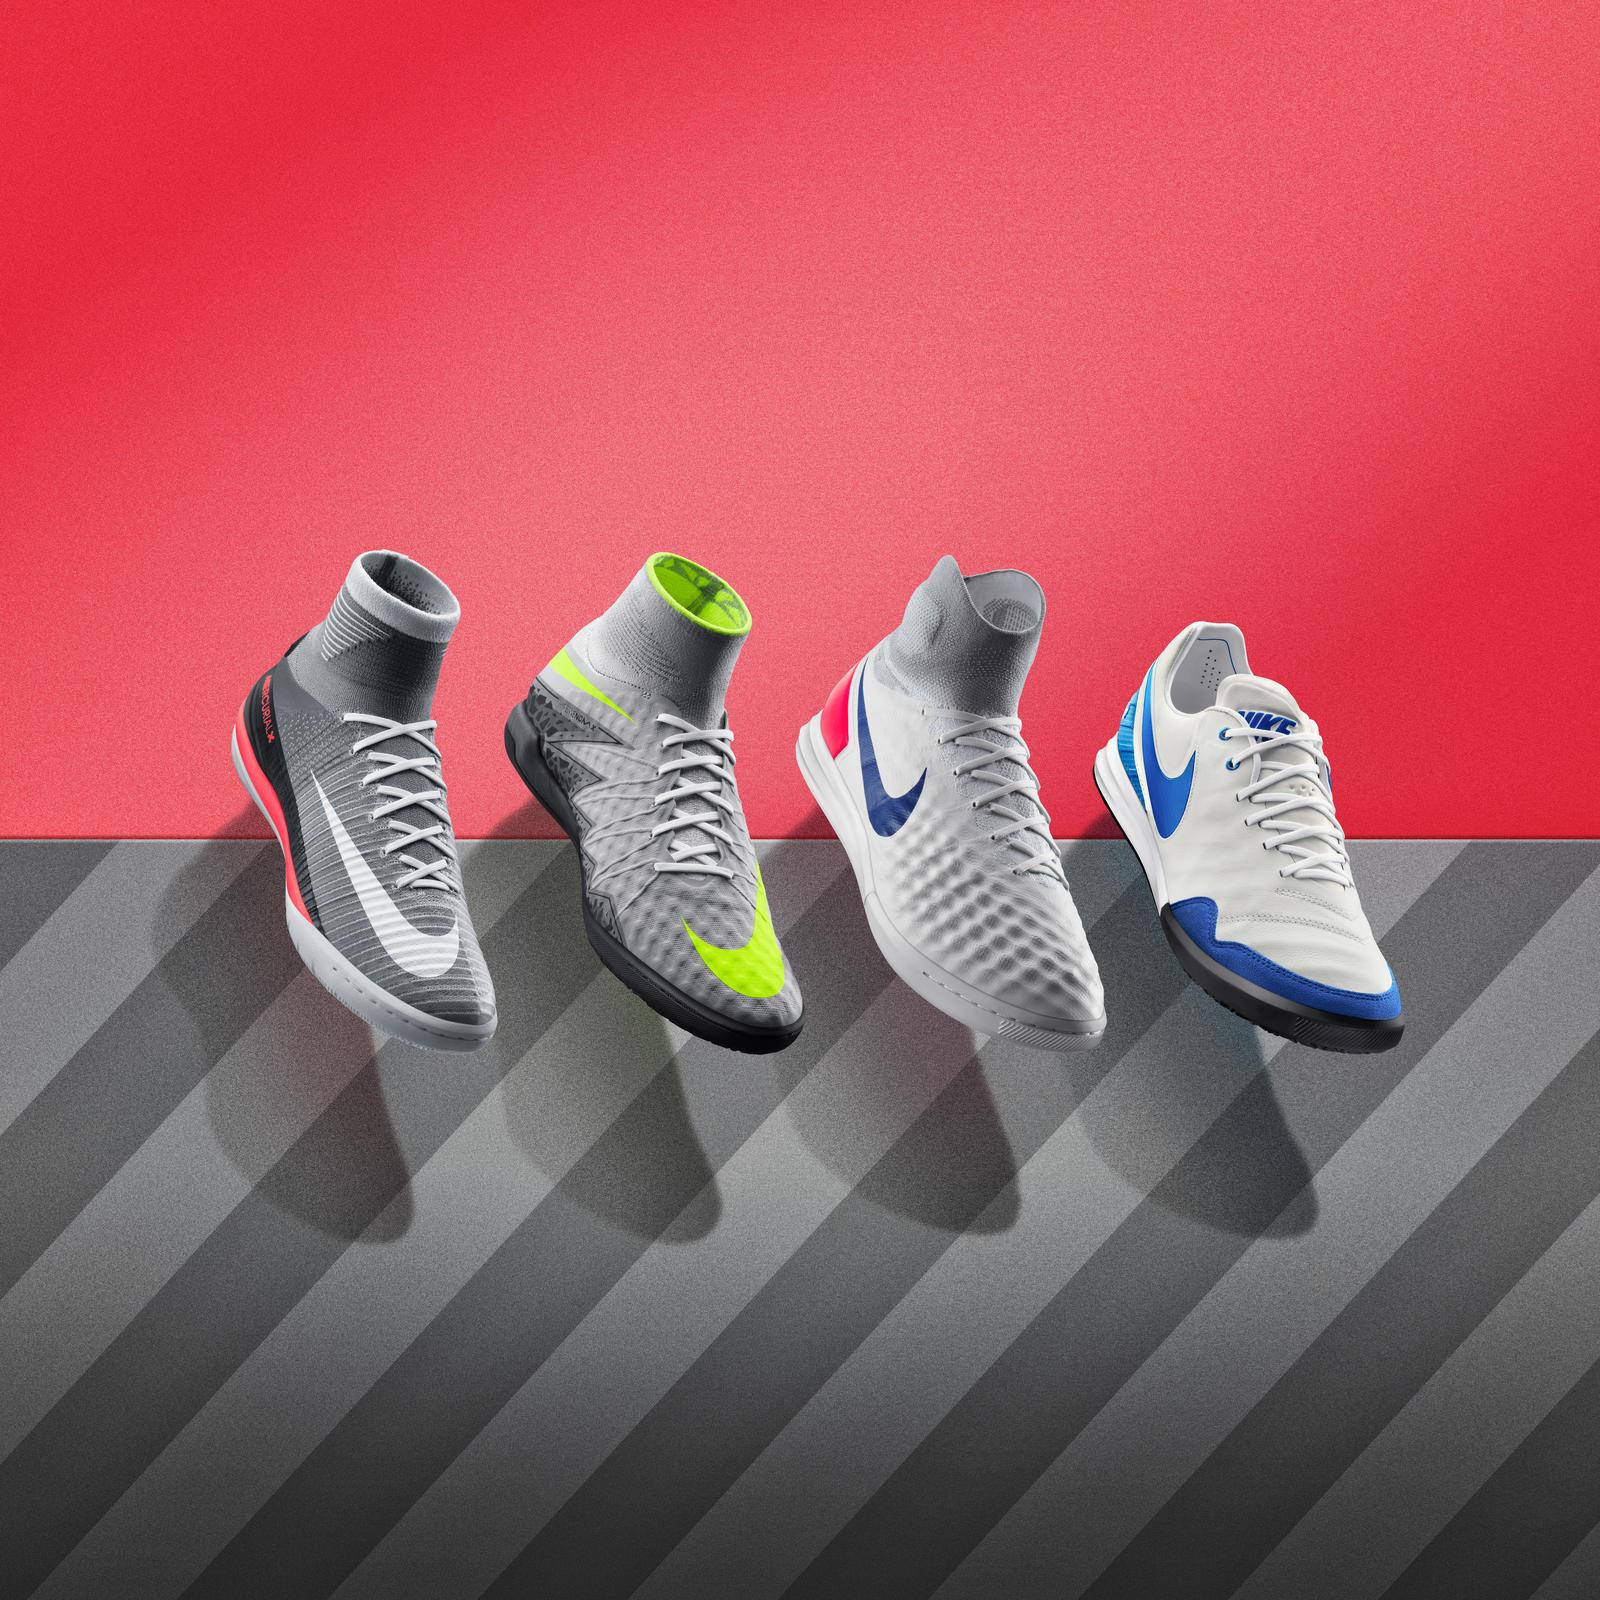 d082626665 Nike launch NikeFootballX Heritage Pack! - Arunava about Football